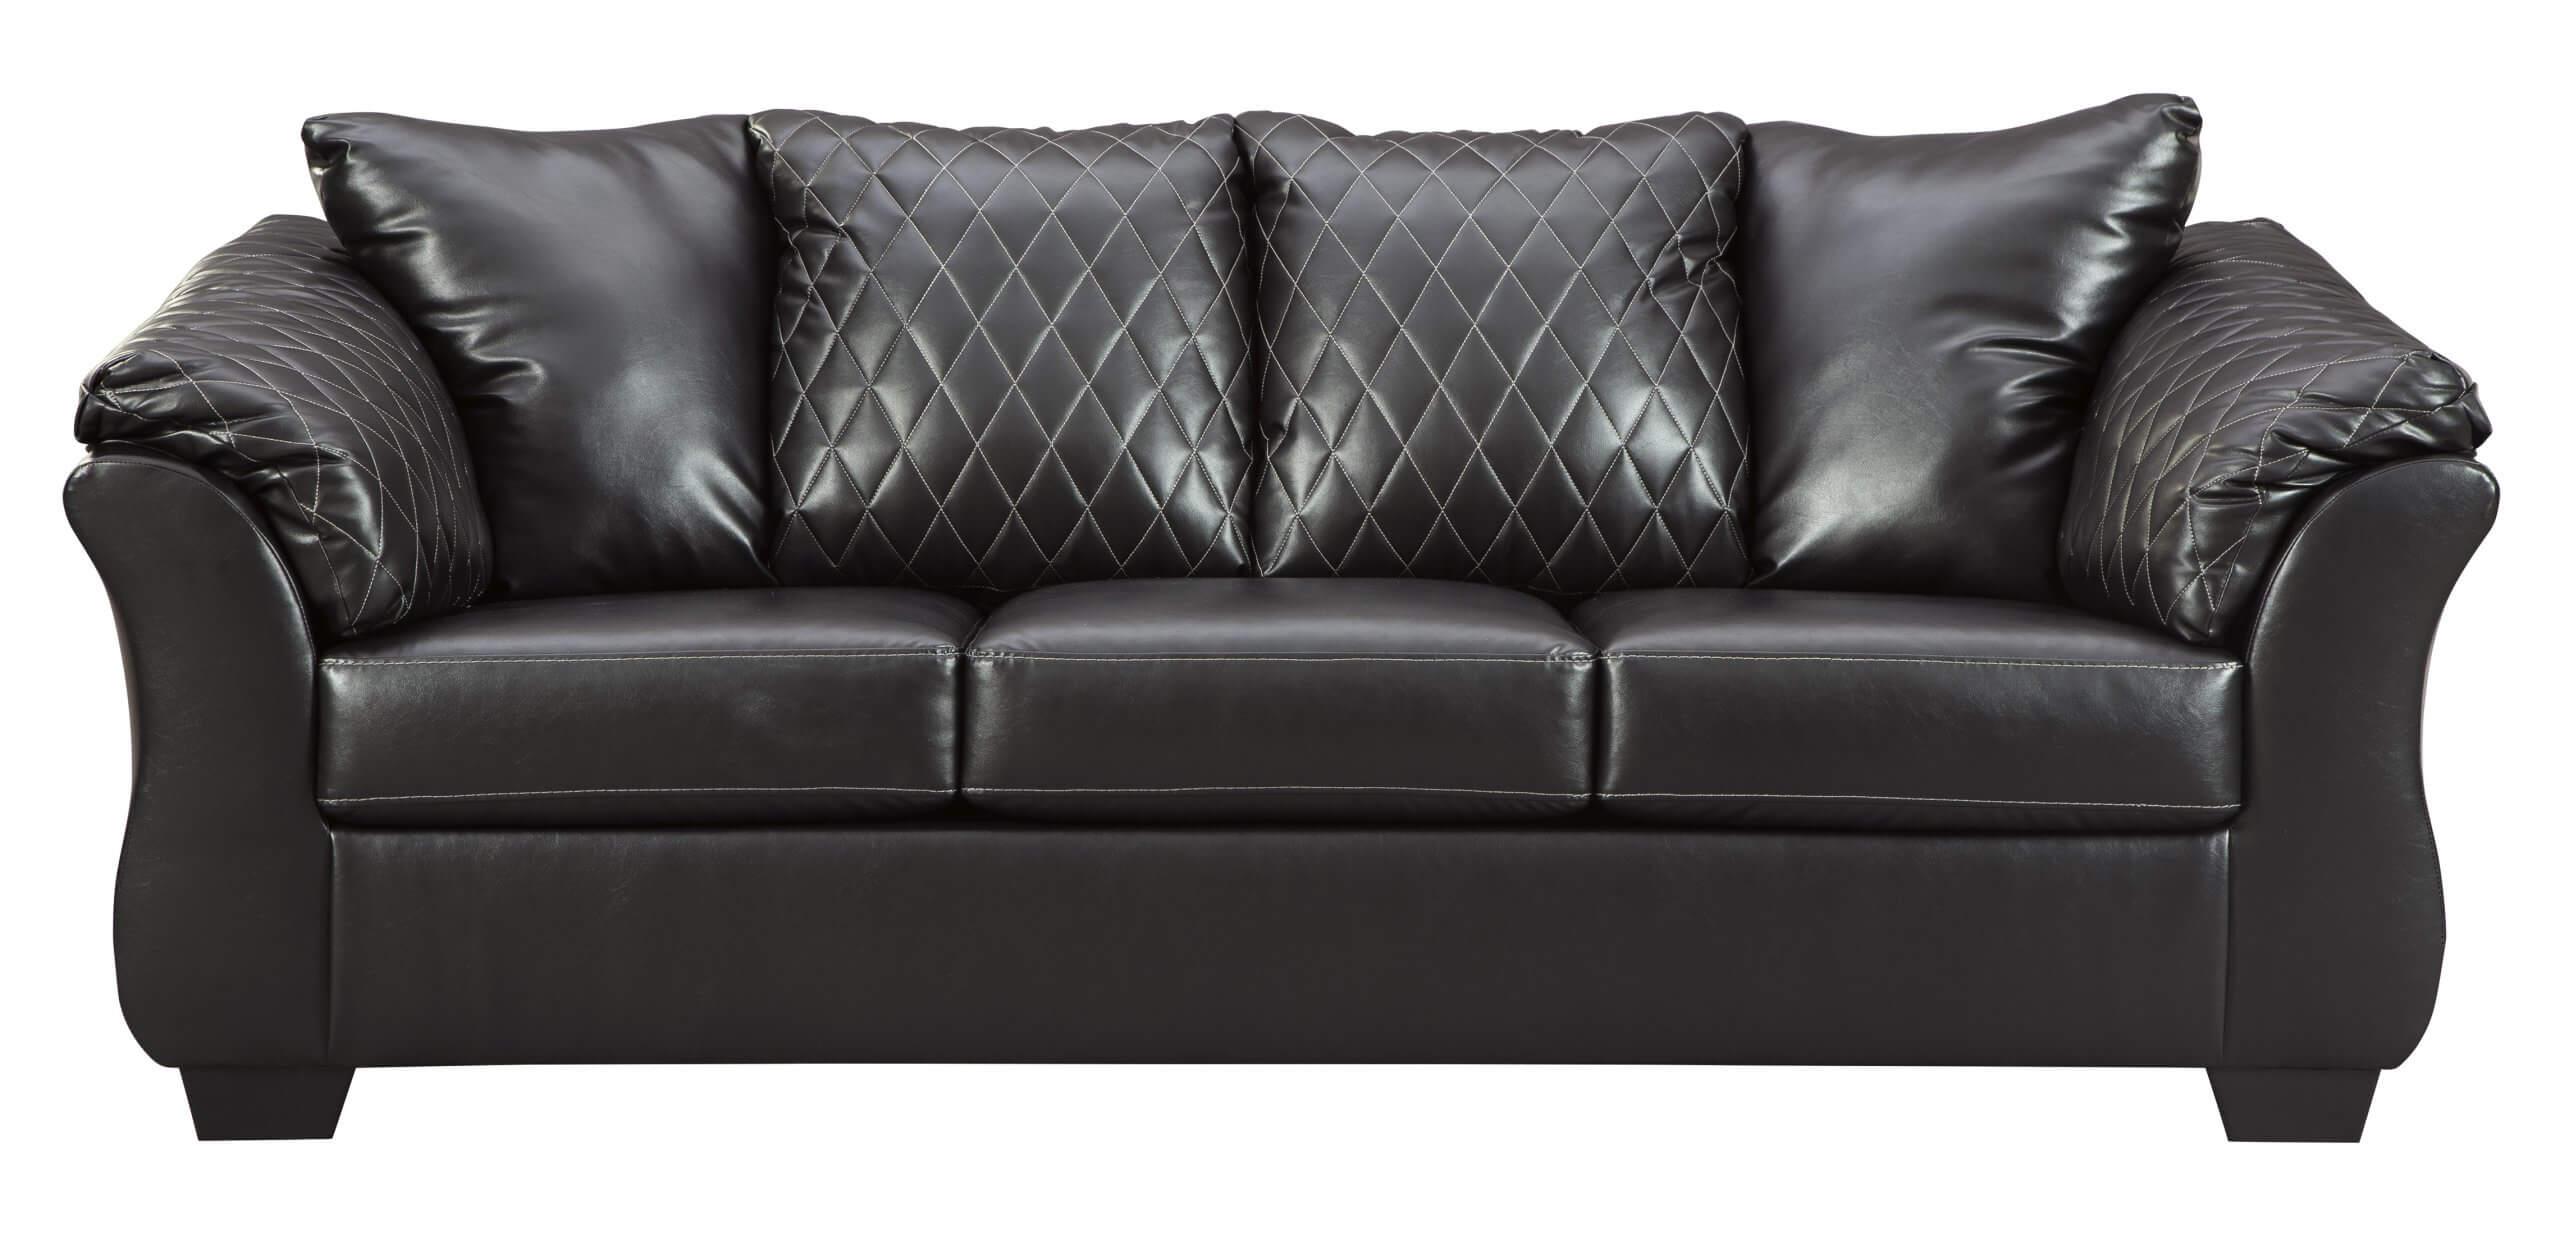 Betrillo Black Sofa and Loveseat Set | Urban Furniture Outlet